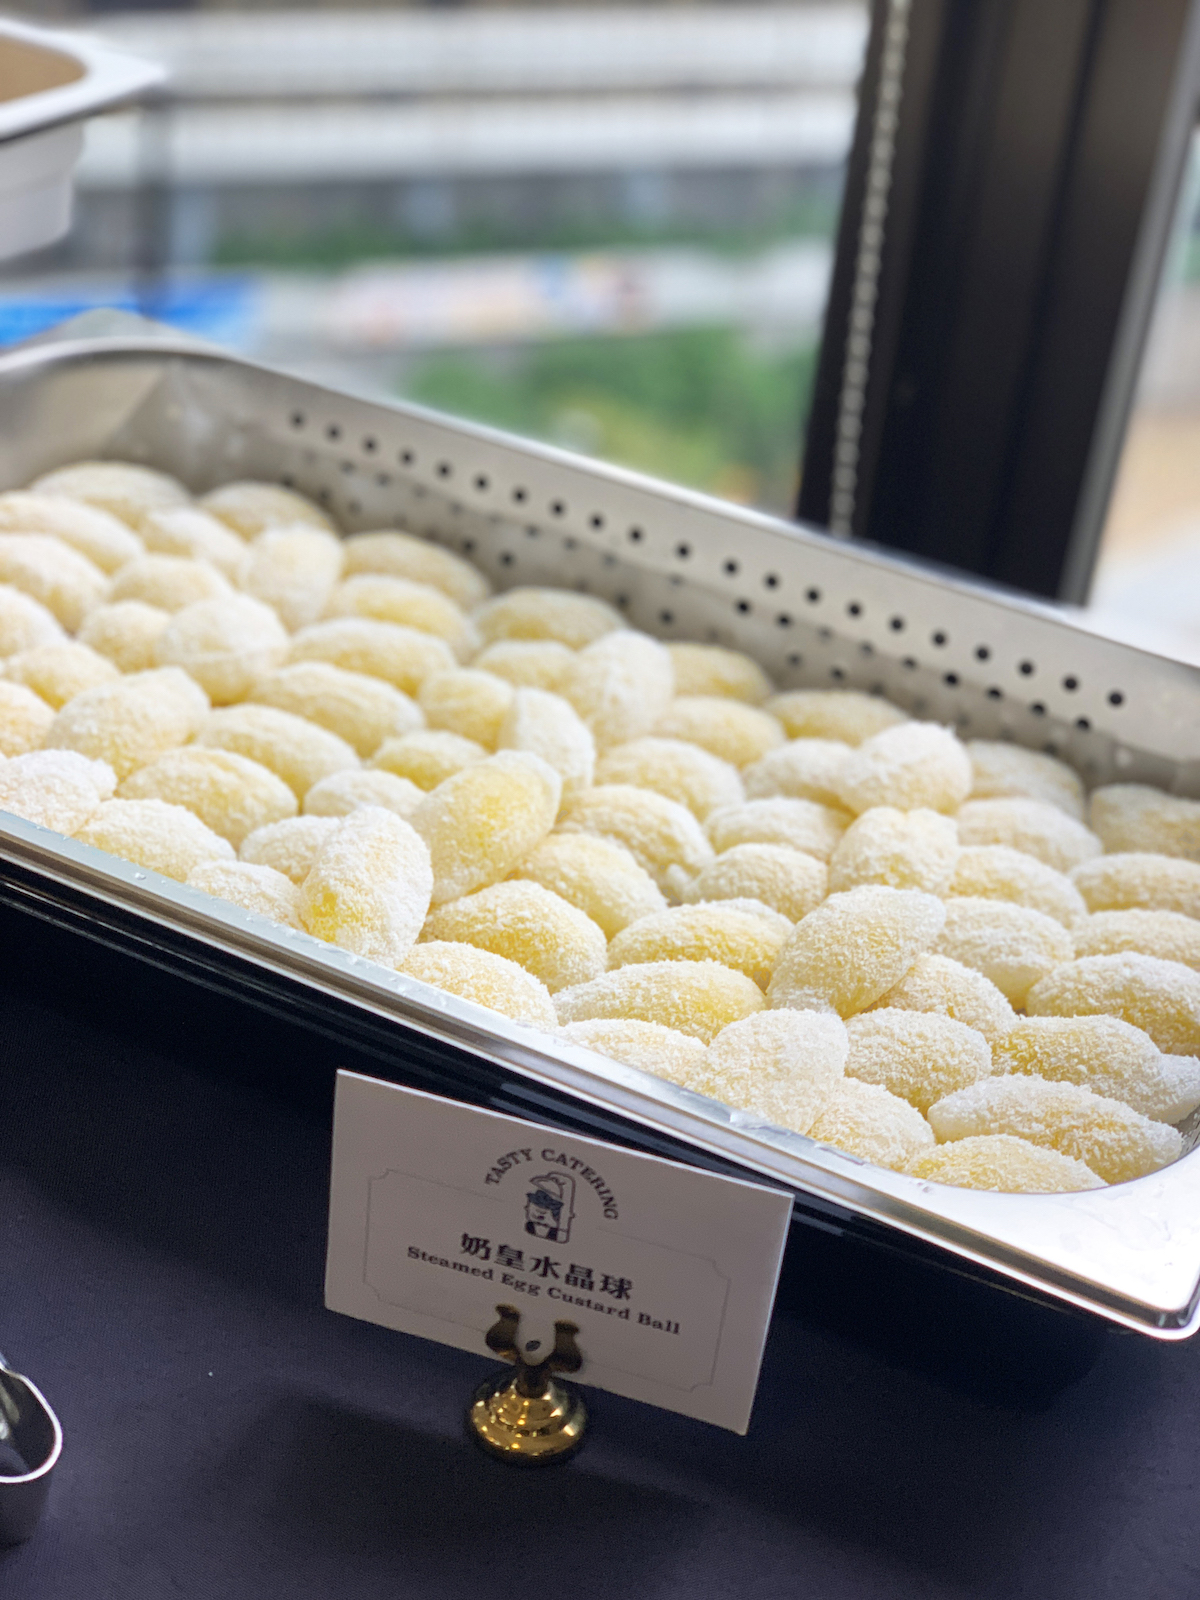 到會美食 - 奶皇水晶球 - Custard Sweet Dumpling with Coconut Flakes - Tasty Catering HK